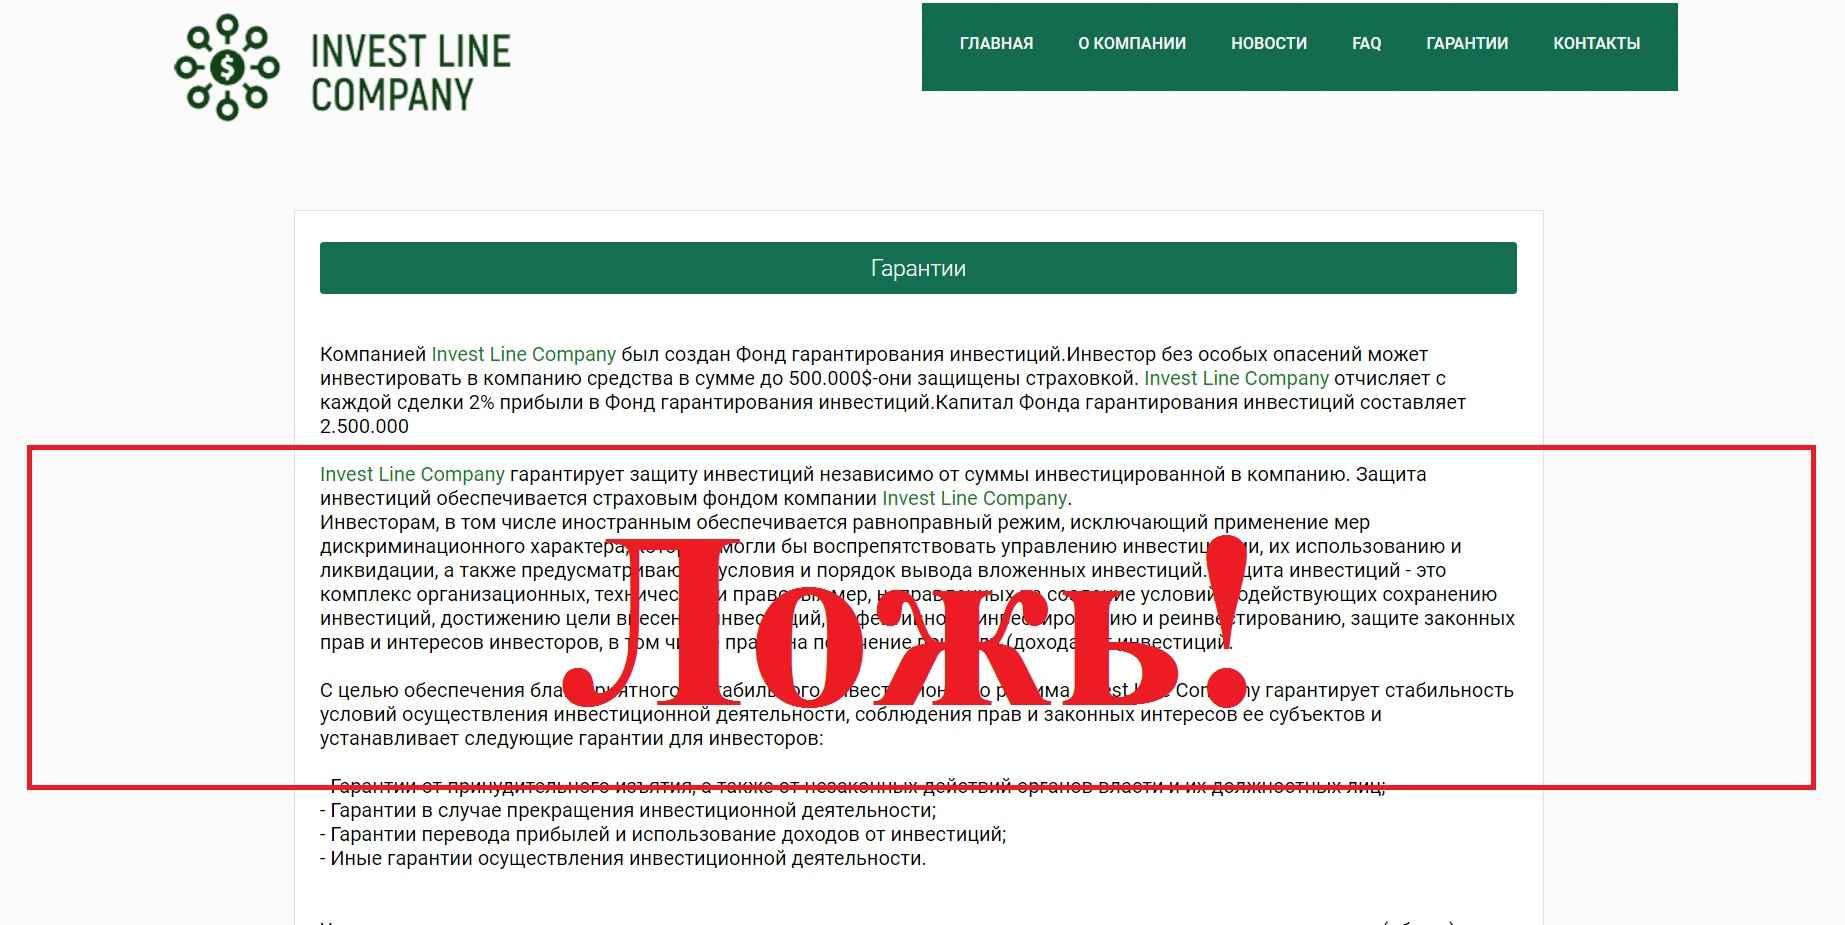 Invest Line Company – реальные отзывы о investlinecompany.ru